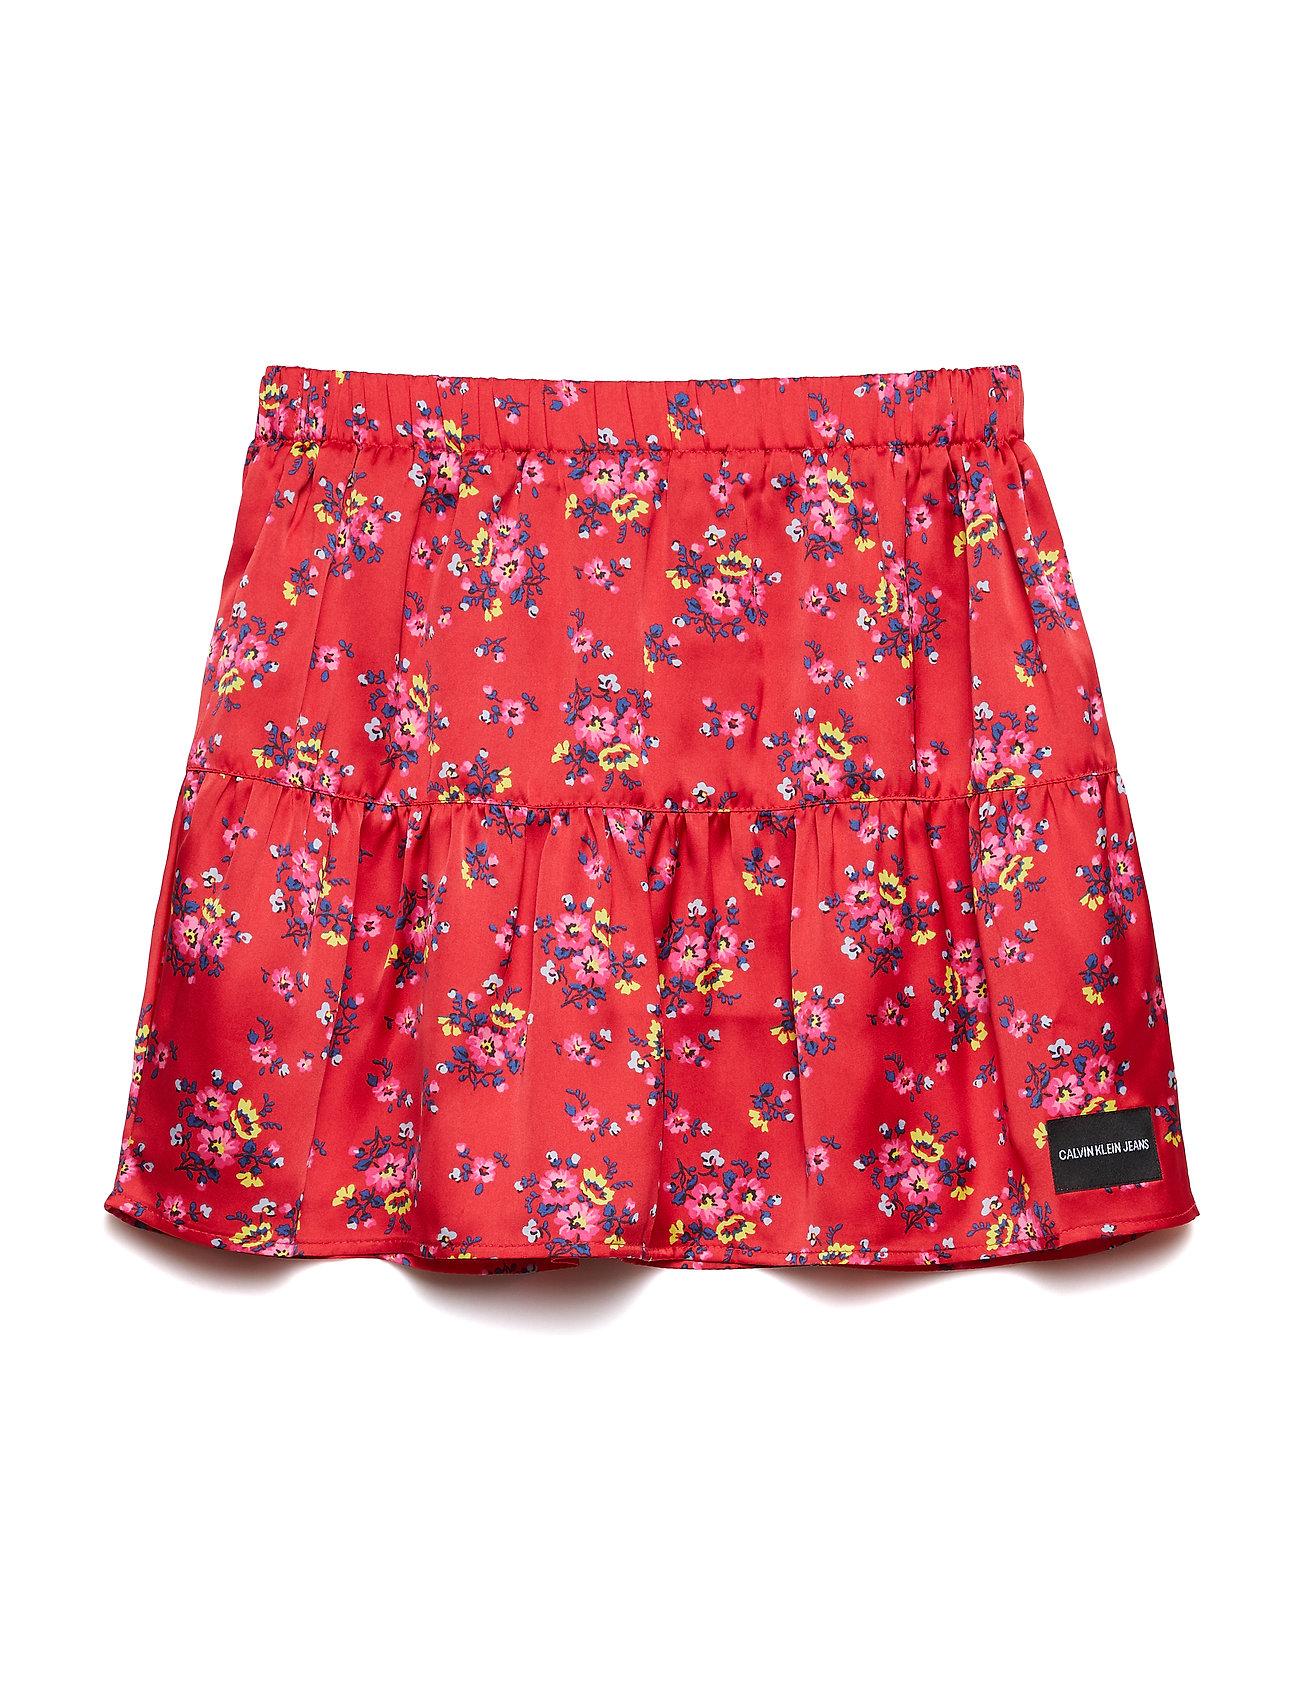 Calvin Klein SATIN FLOWER SKIRT - RACING RED